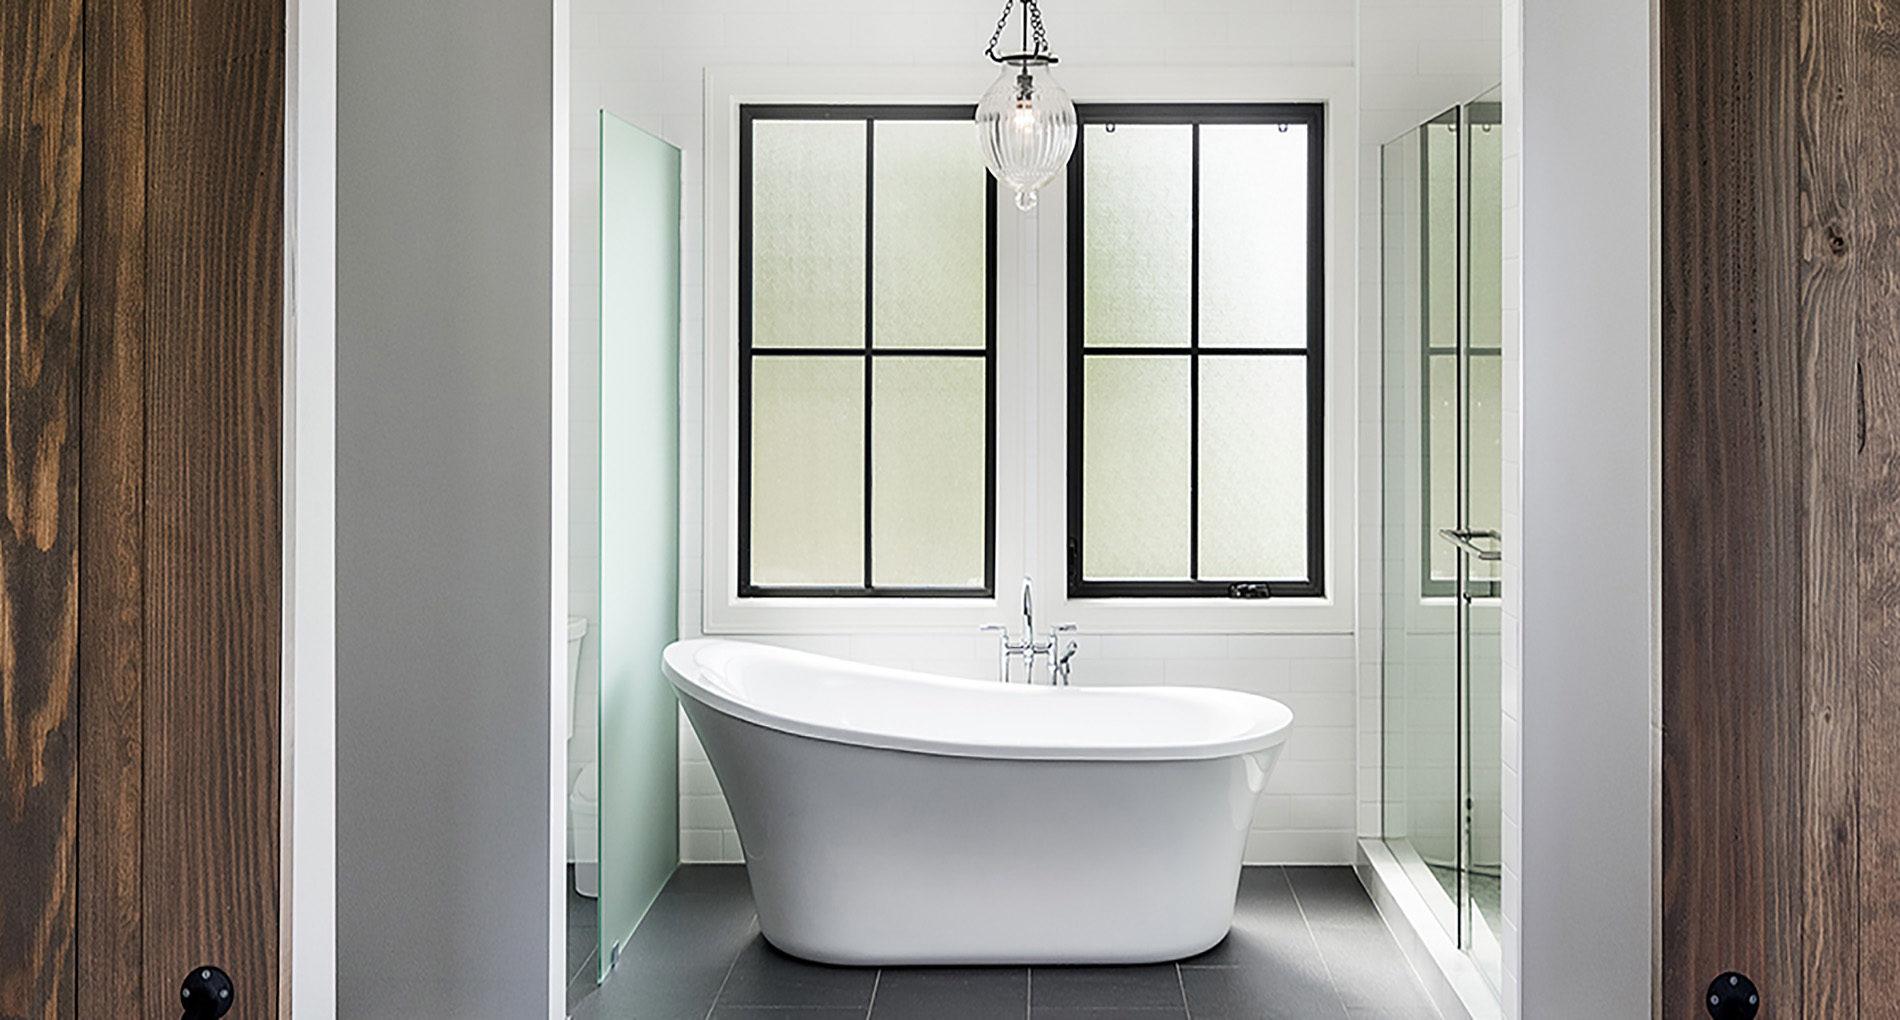 Langley Custom Bathroom Renovations & Design | Alair Homes